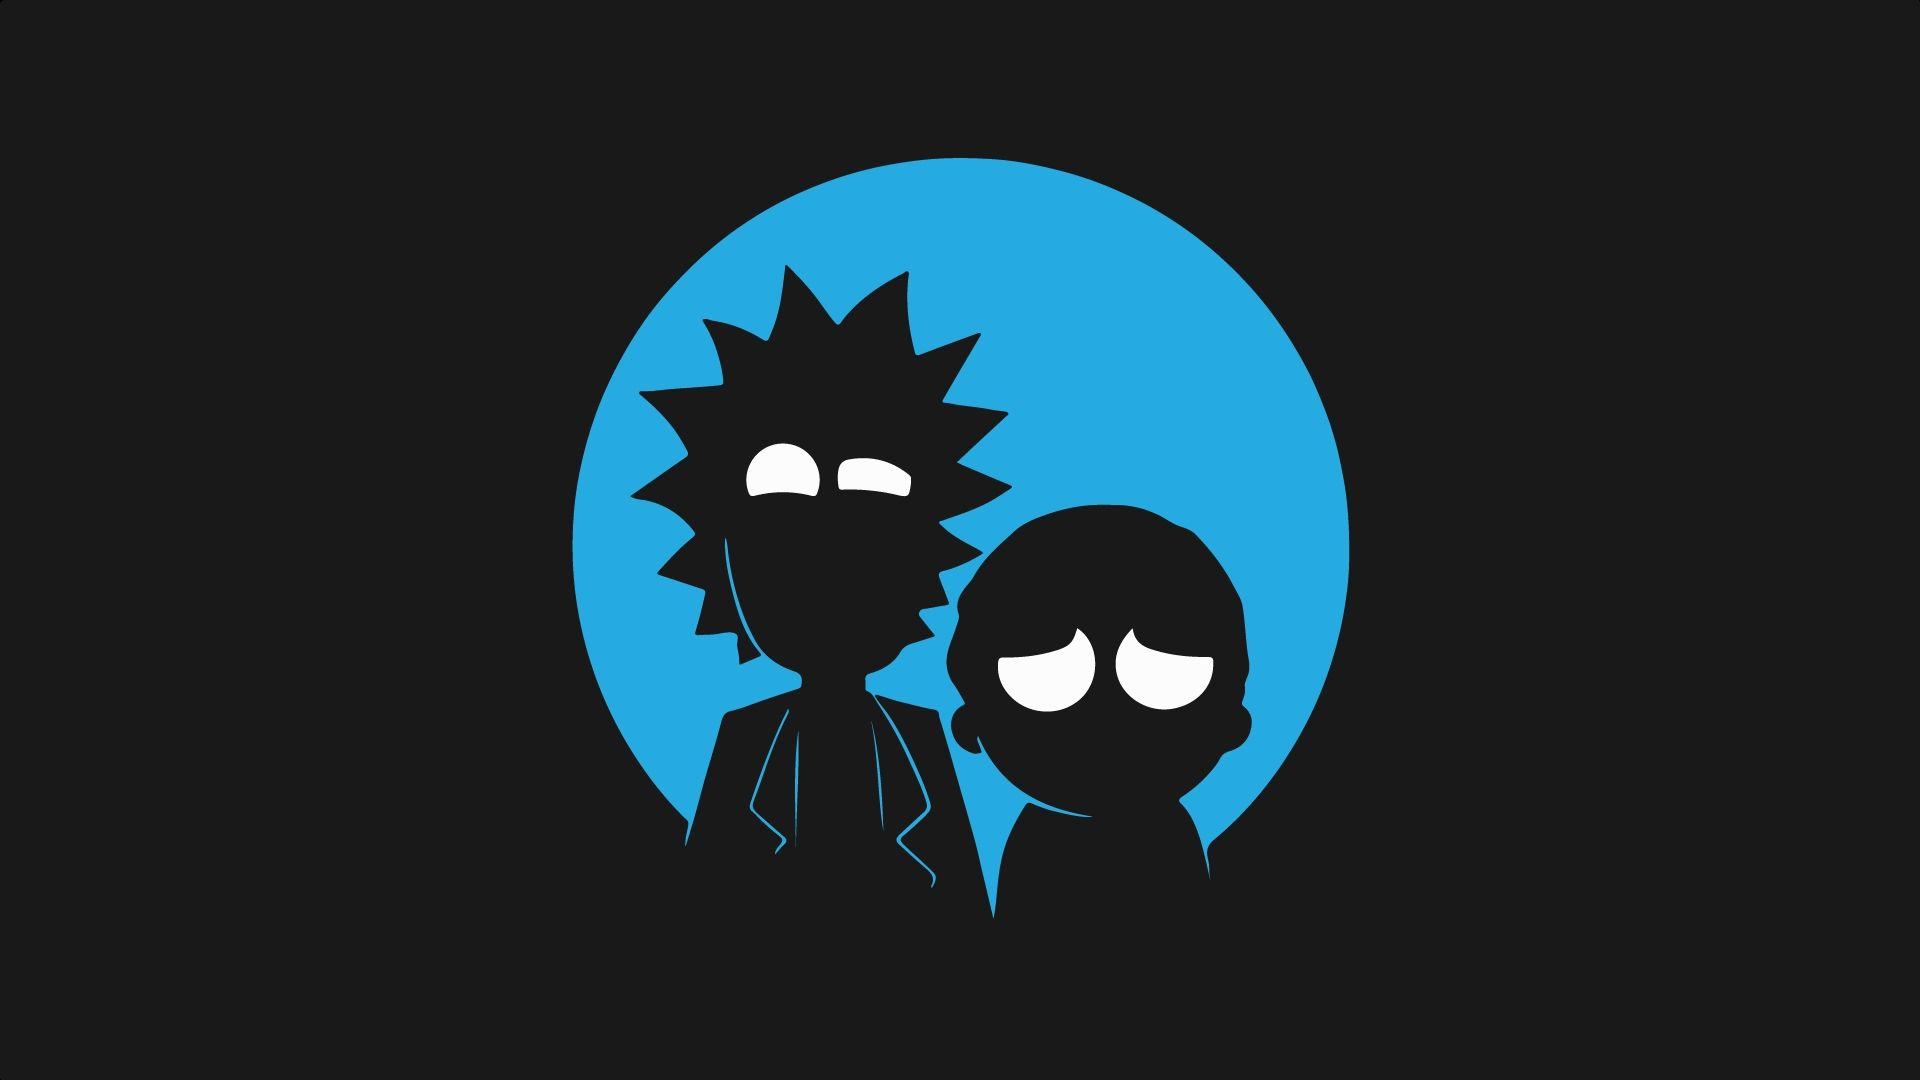 wallpaper Rick and Morty